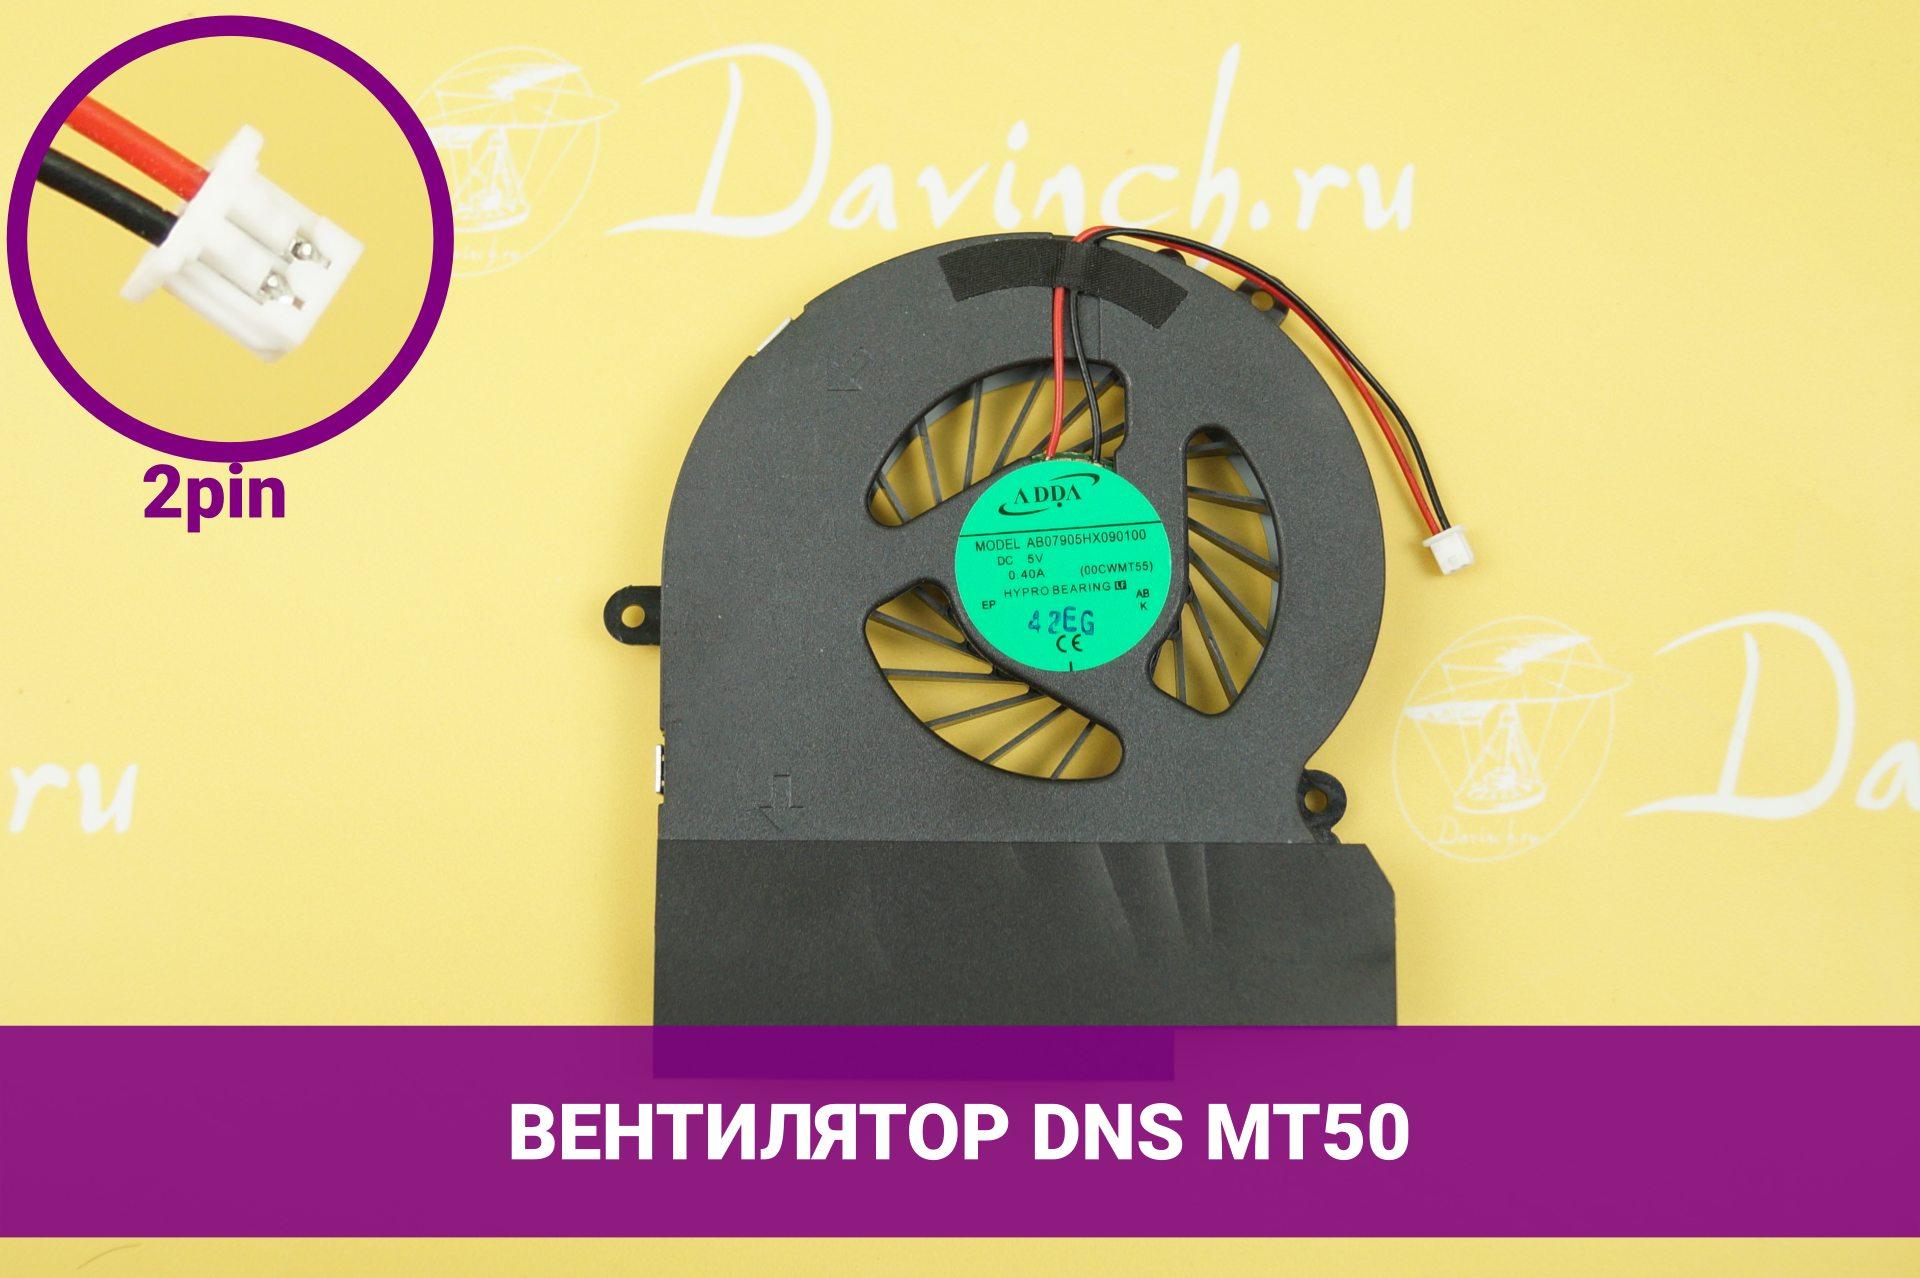 Вентилятор для ноутбука DNS MT50